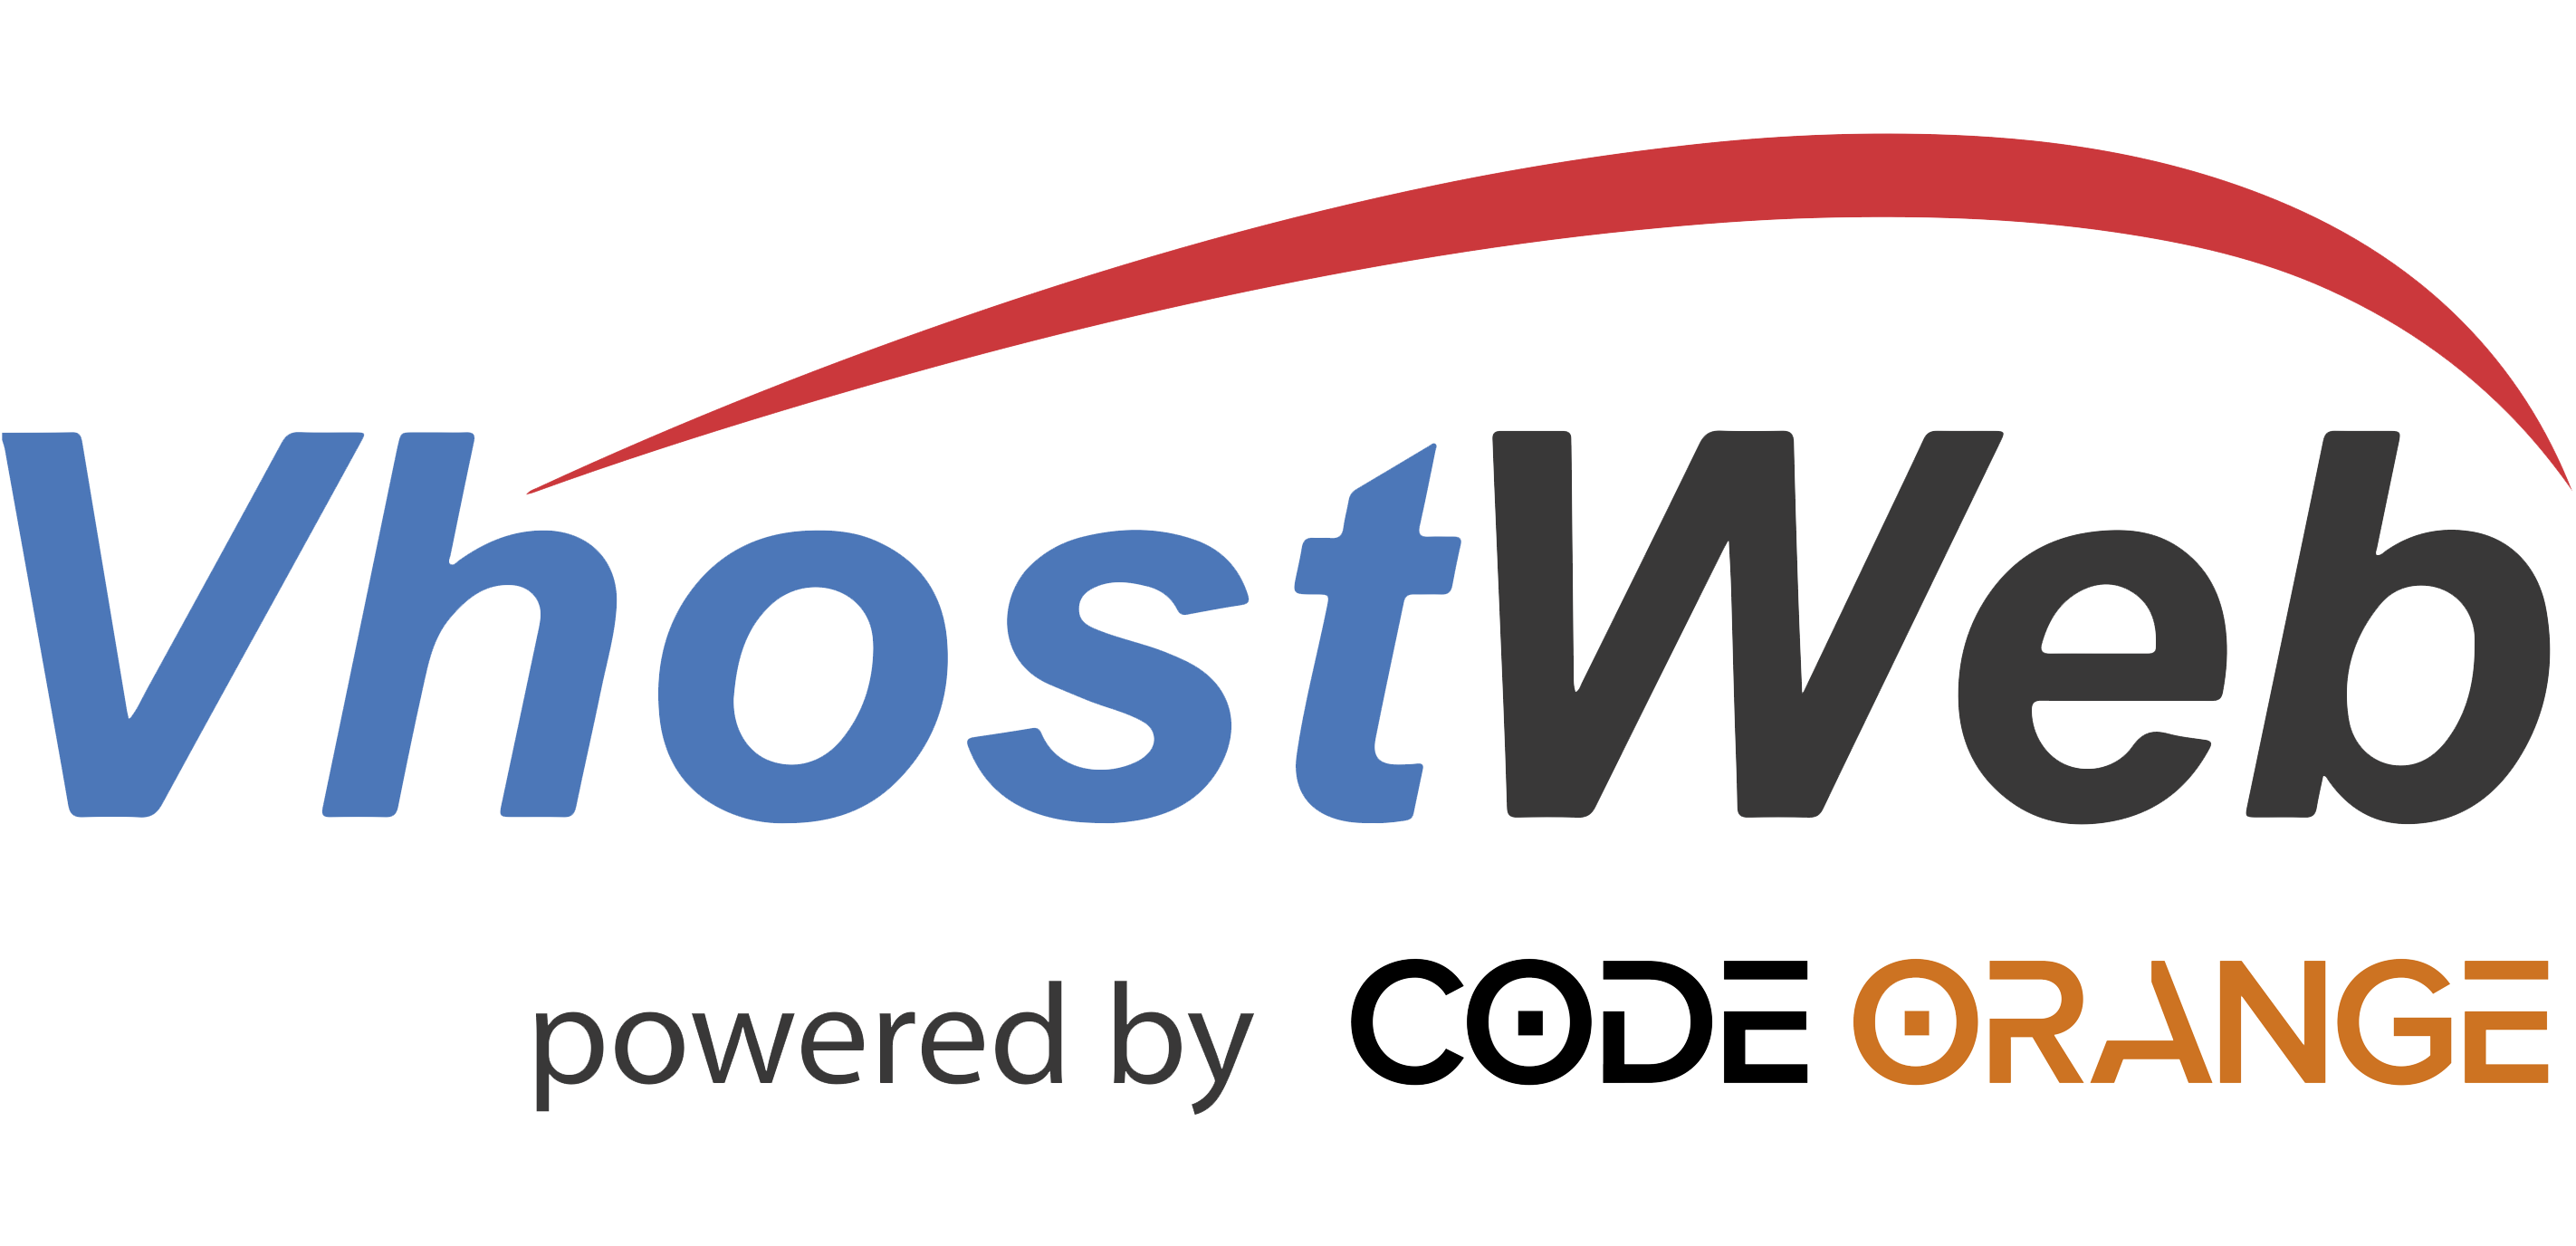 vhostweb logo